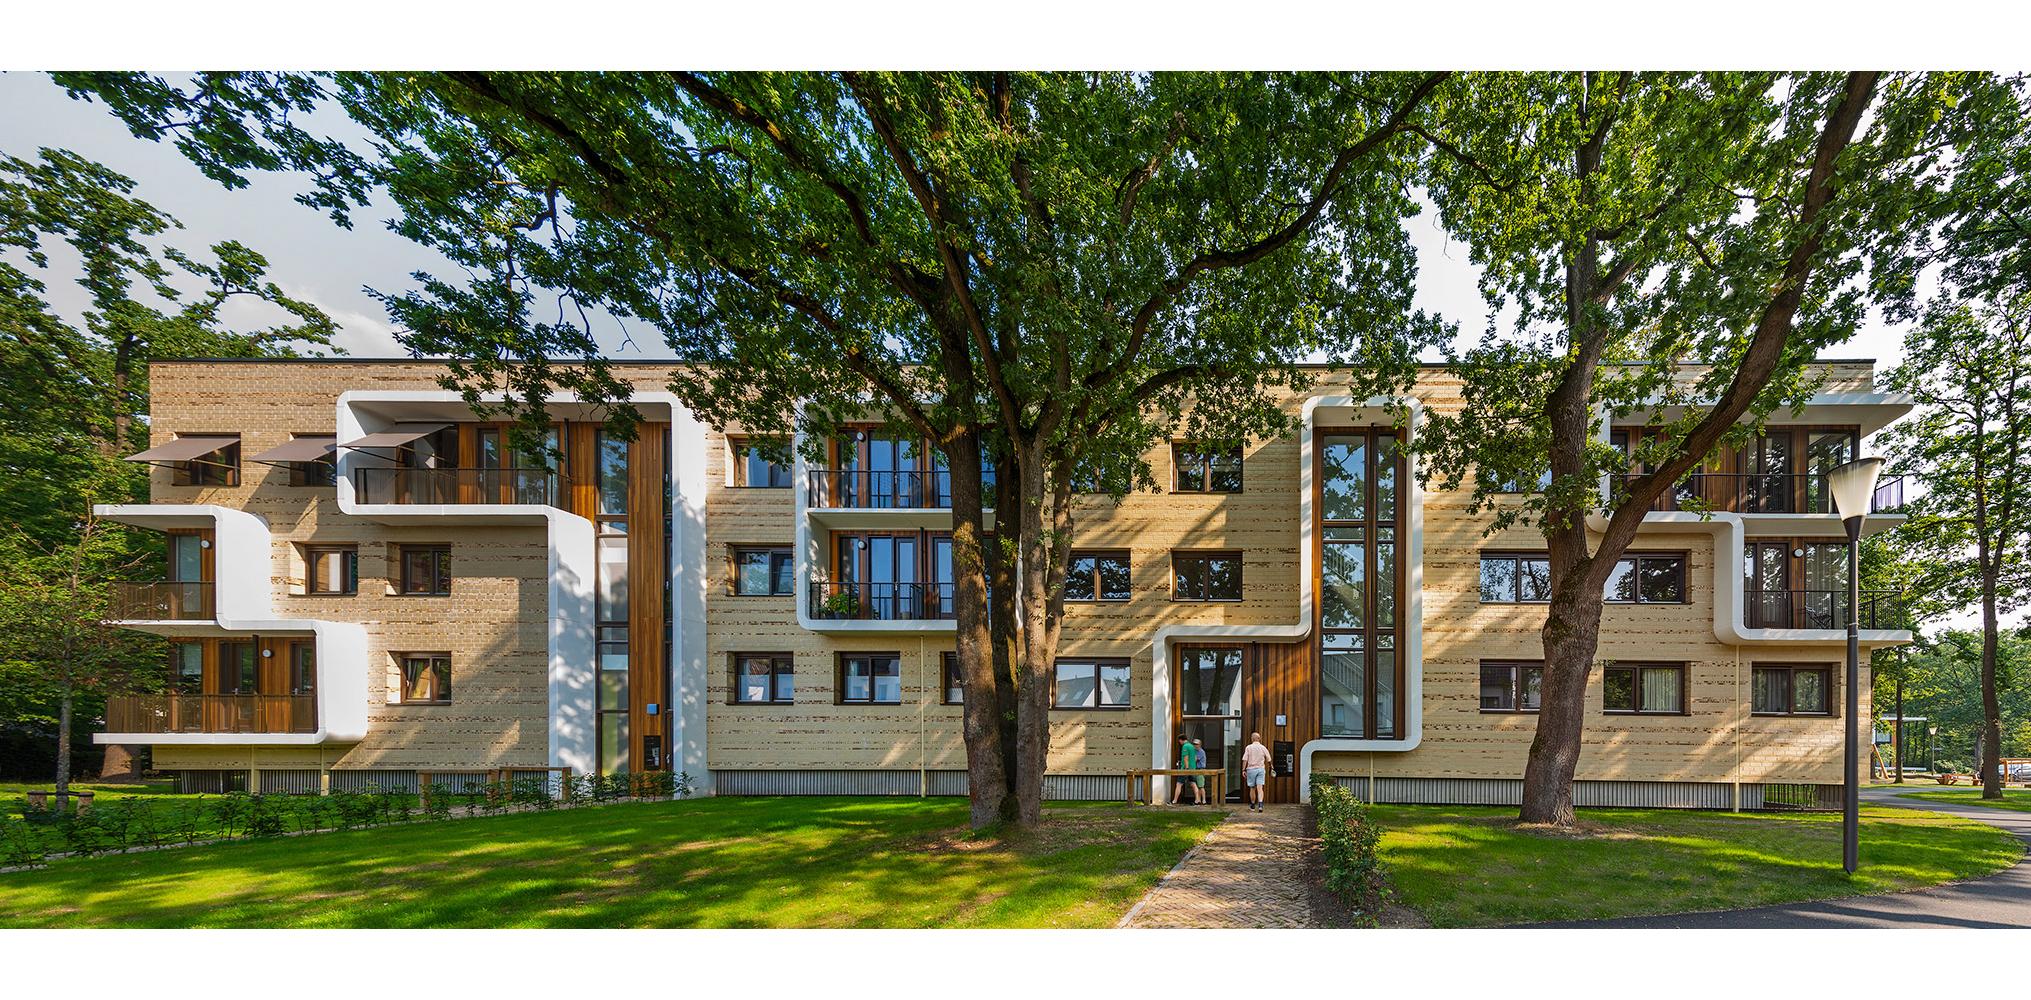 Simone Drost Architecture Planet Pab Architecture Appartementen Stdhouderspark Vught voorgevel overzicht entreegevel